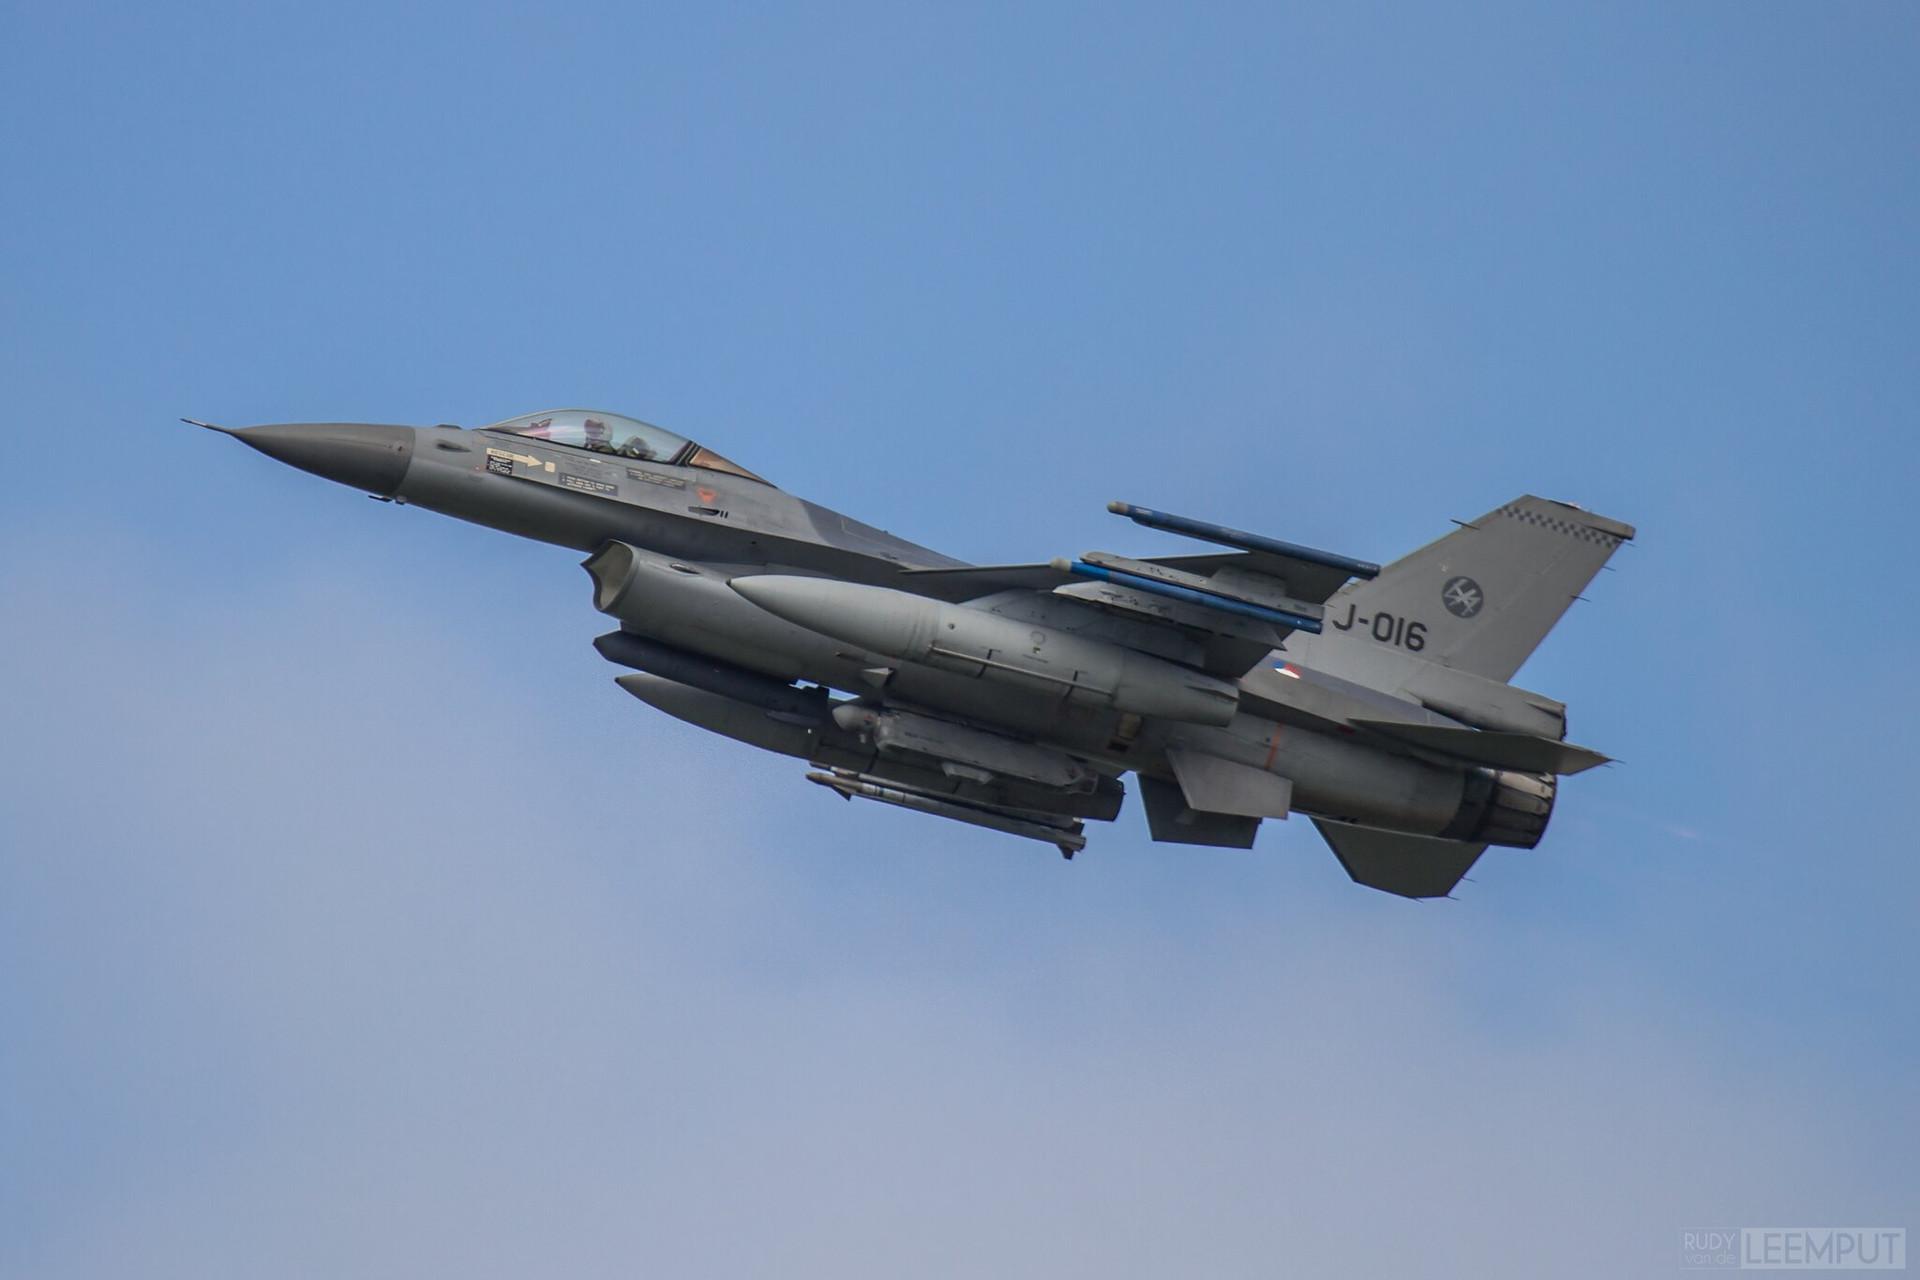 J-016   Build: 1991 - Lockheed F-16 A Fighting Falcon